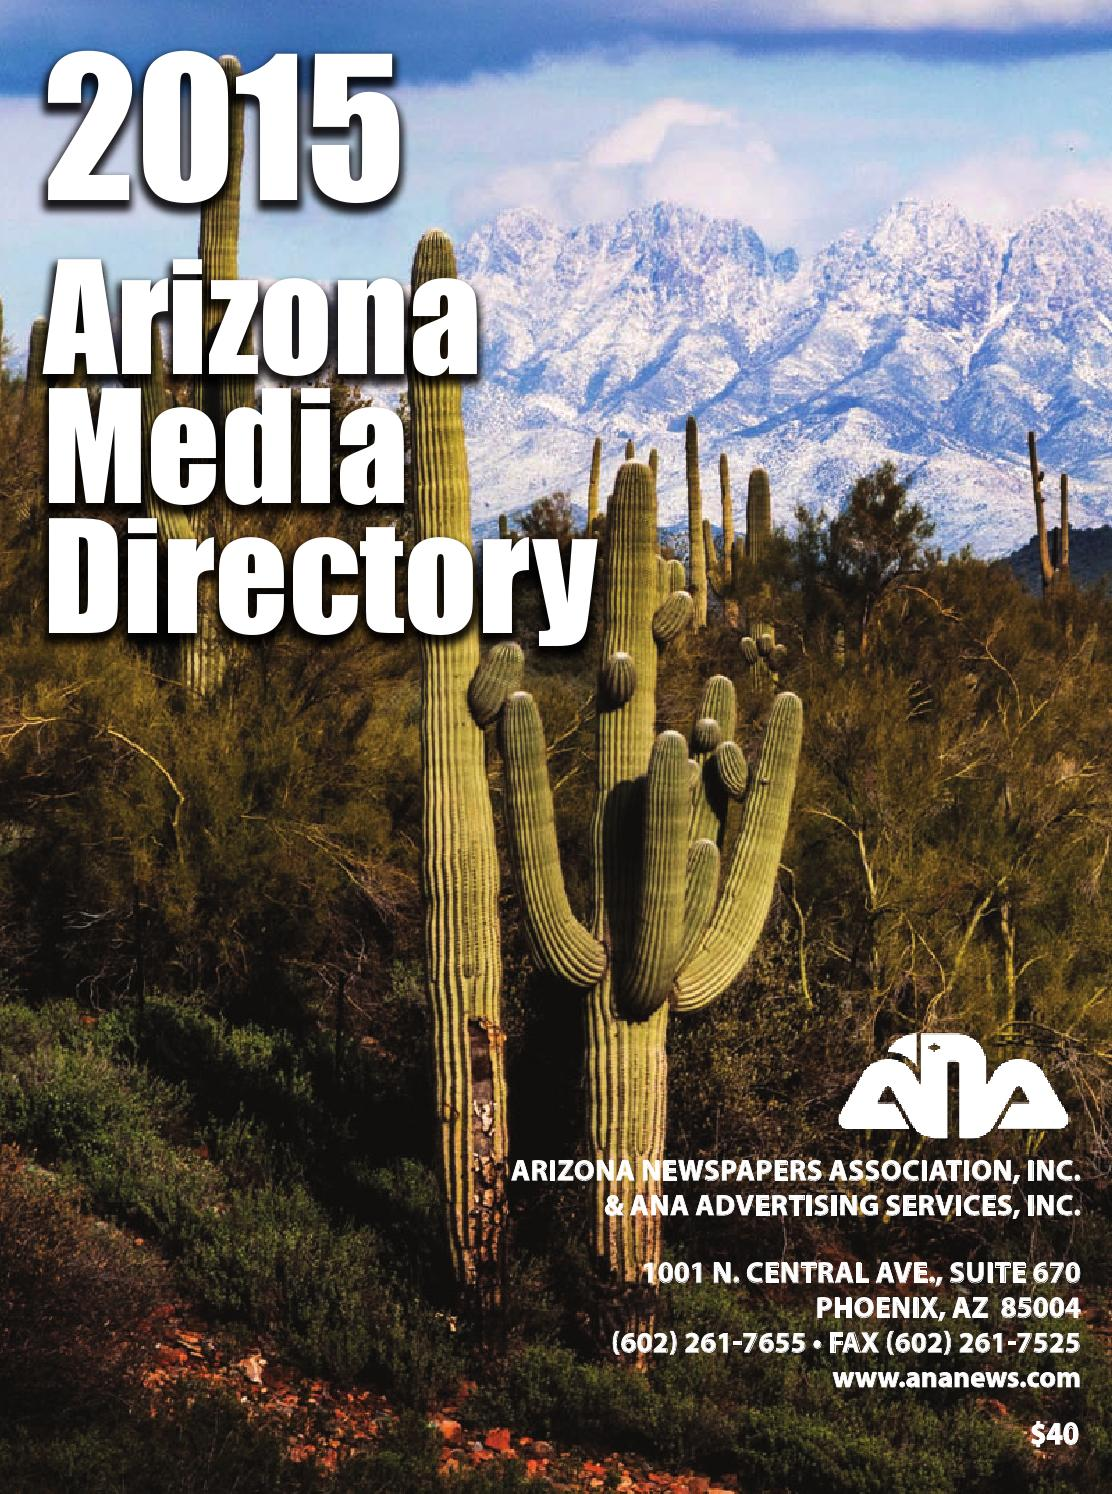 ANA 2015 media directory by Arizona Newspapers Association